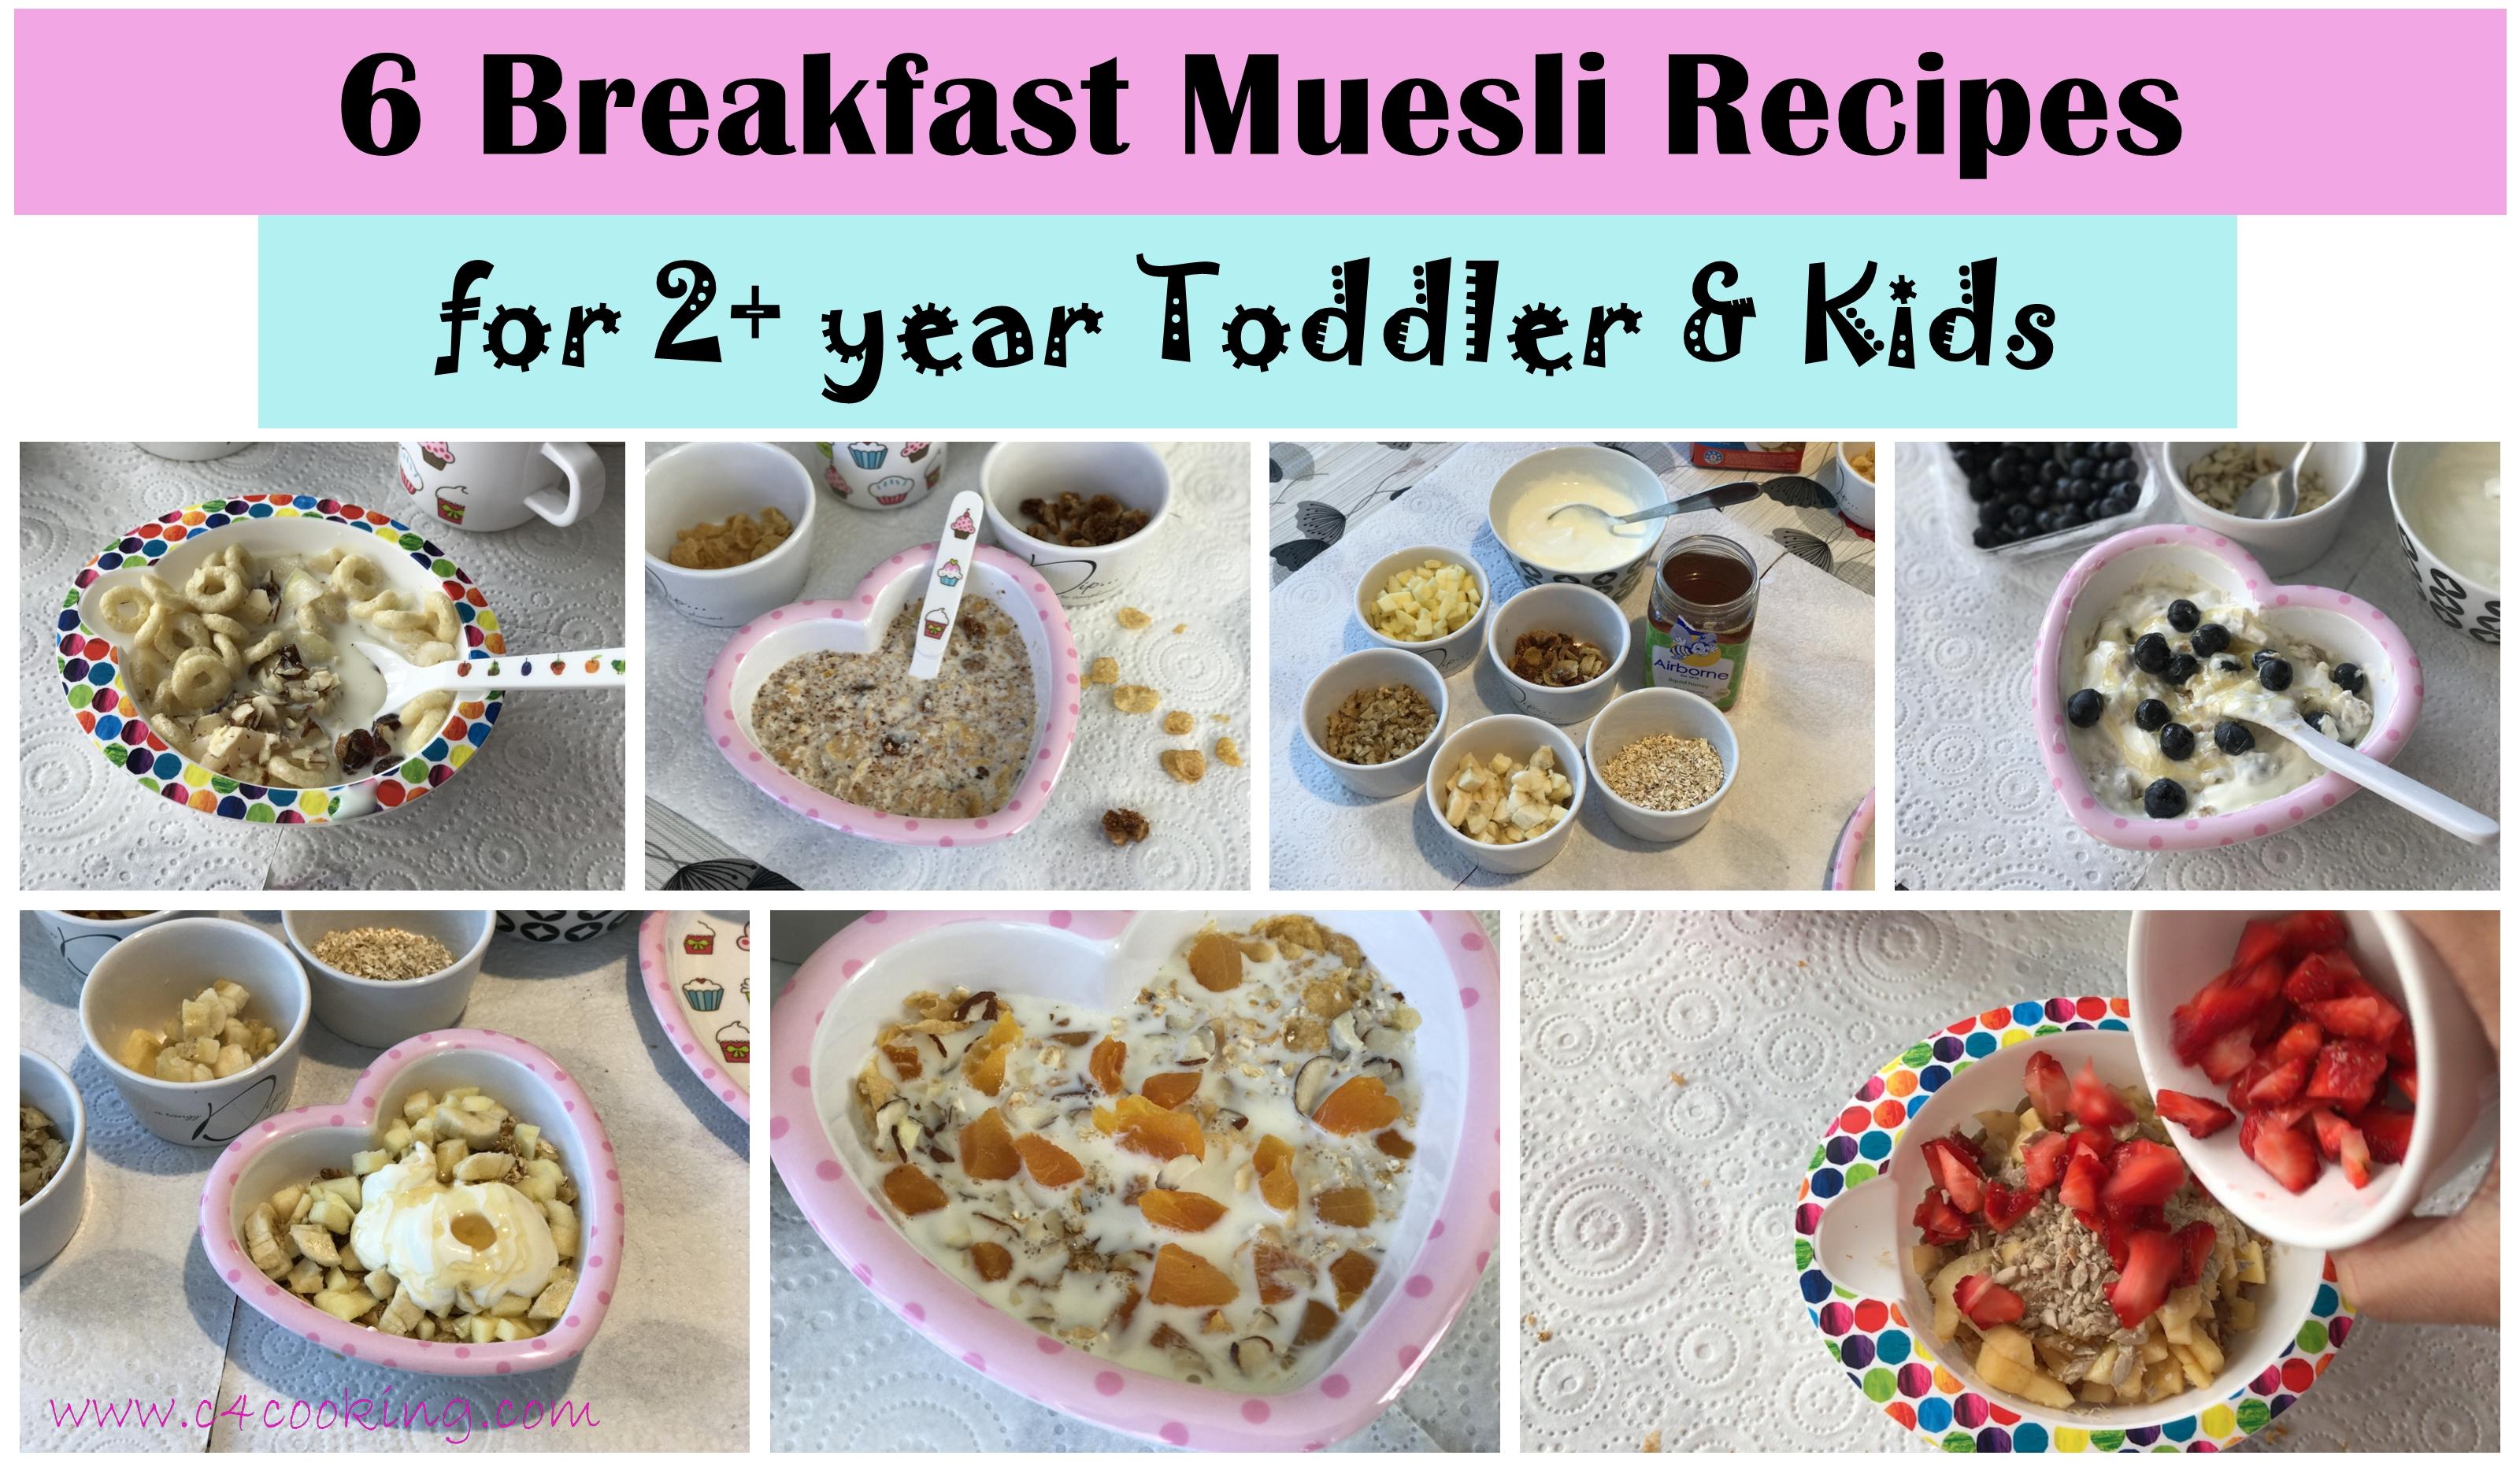 6 breakfast muesli recipes, c4cooking baby kids muesi recipes